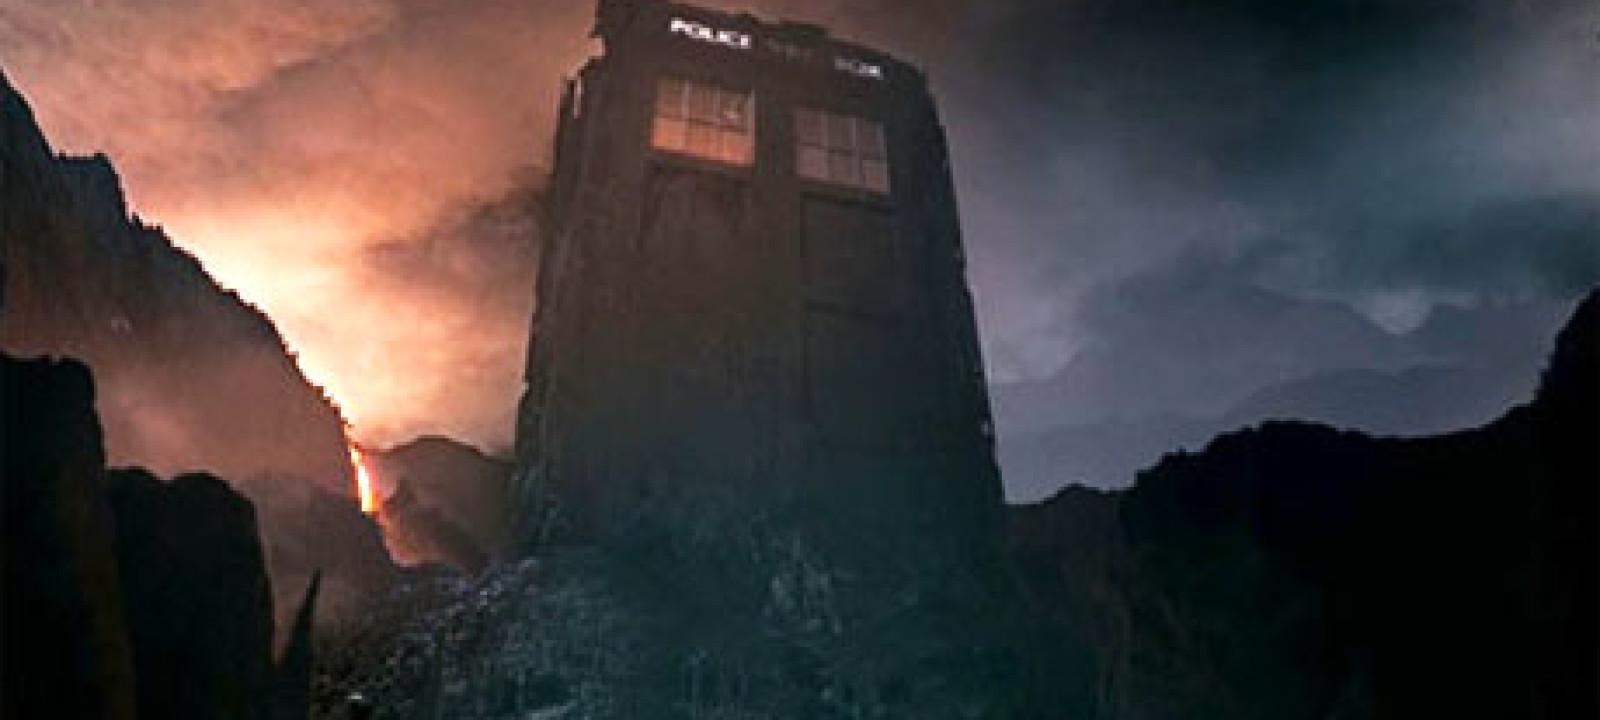 The TARDIS on Trenzalore